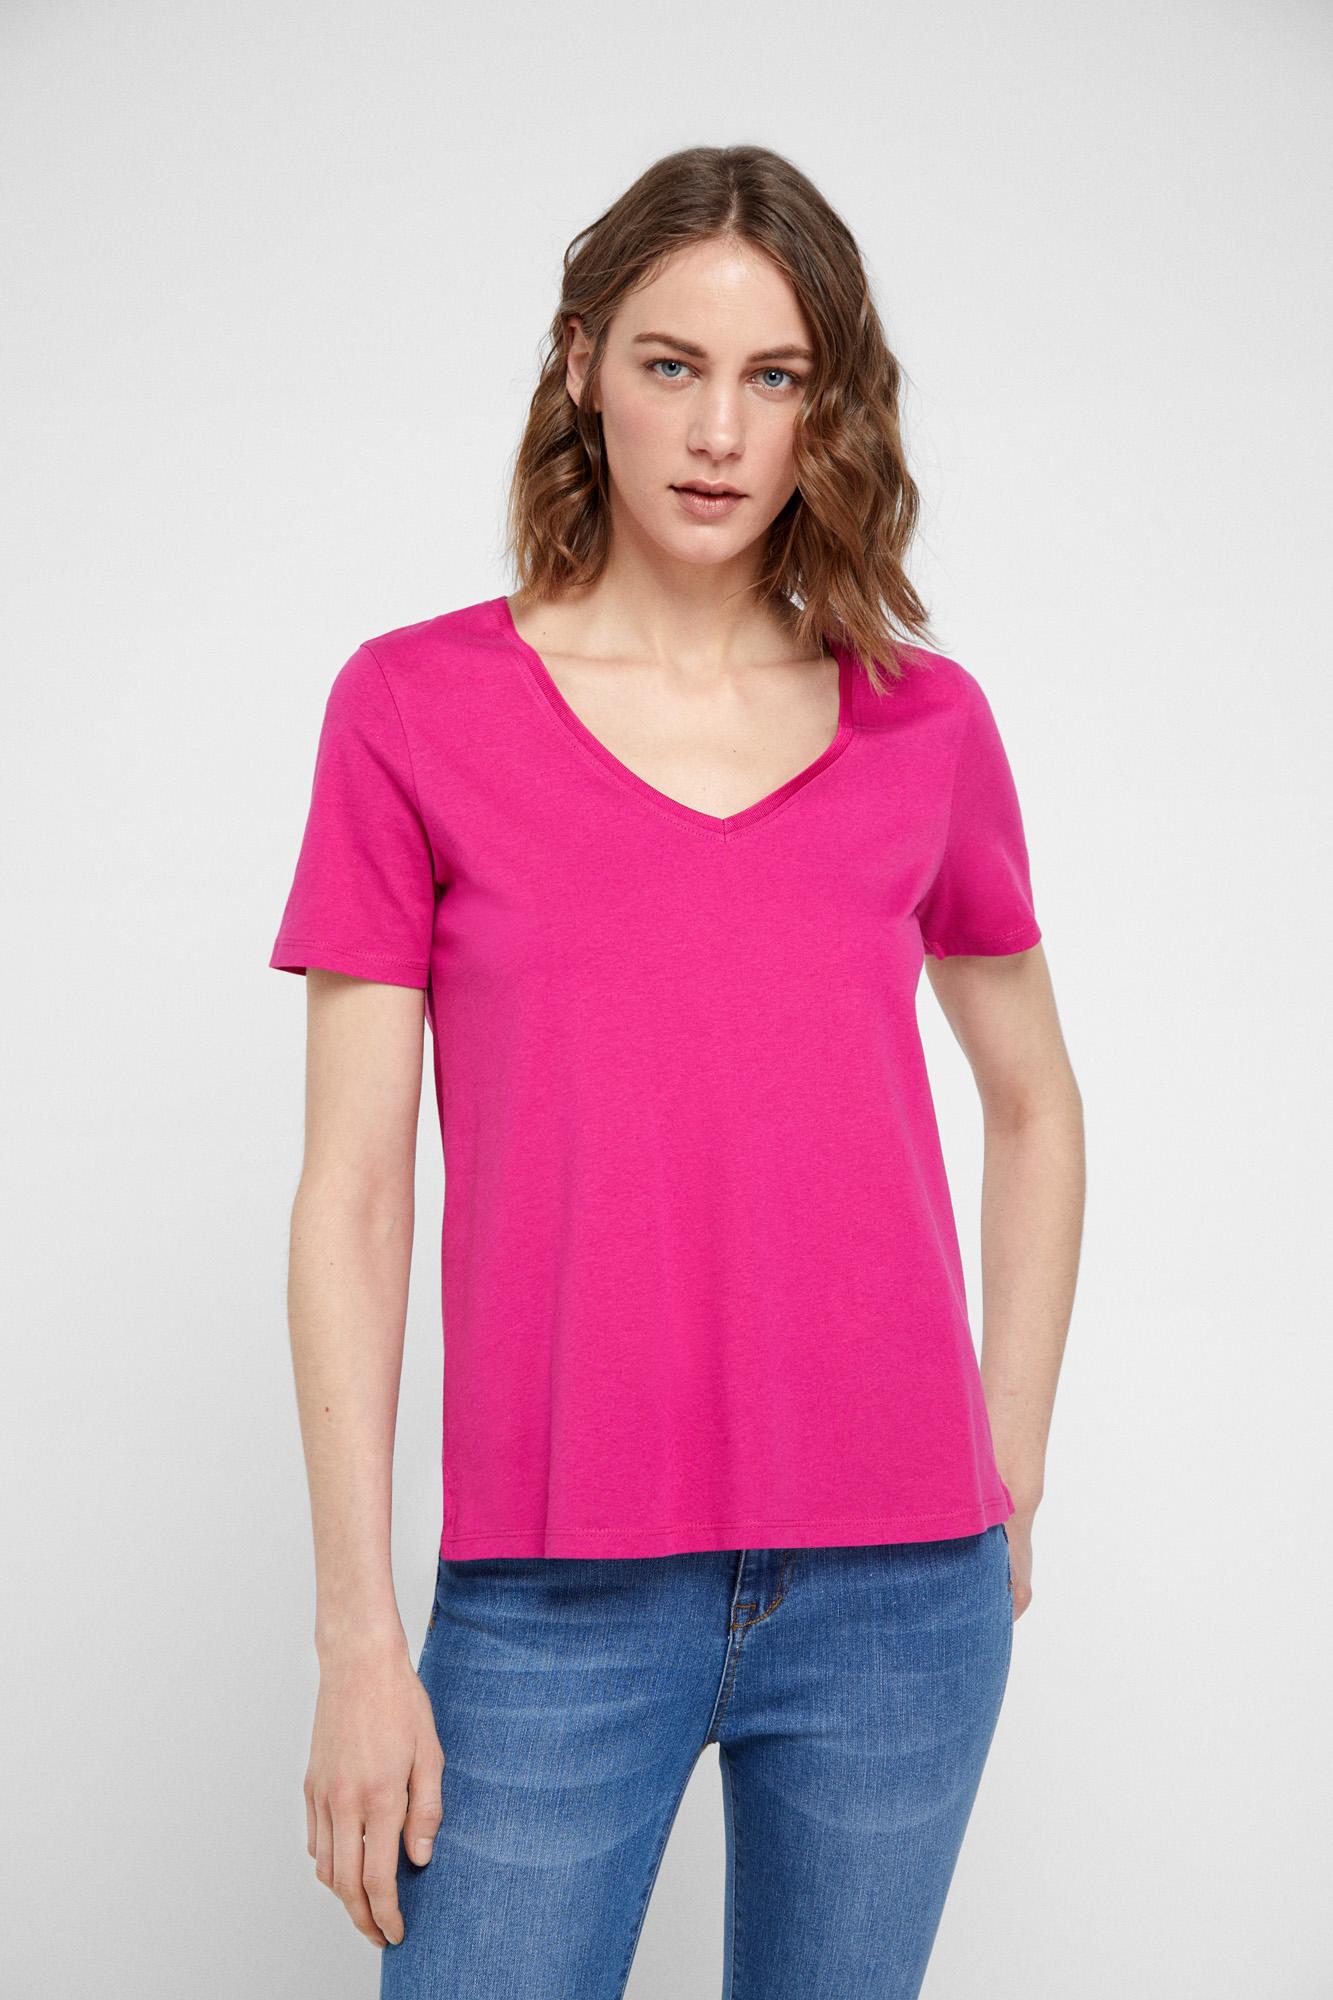 Camiseta tejido orgánico escote pico | Camisetas | Fifty